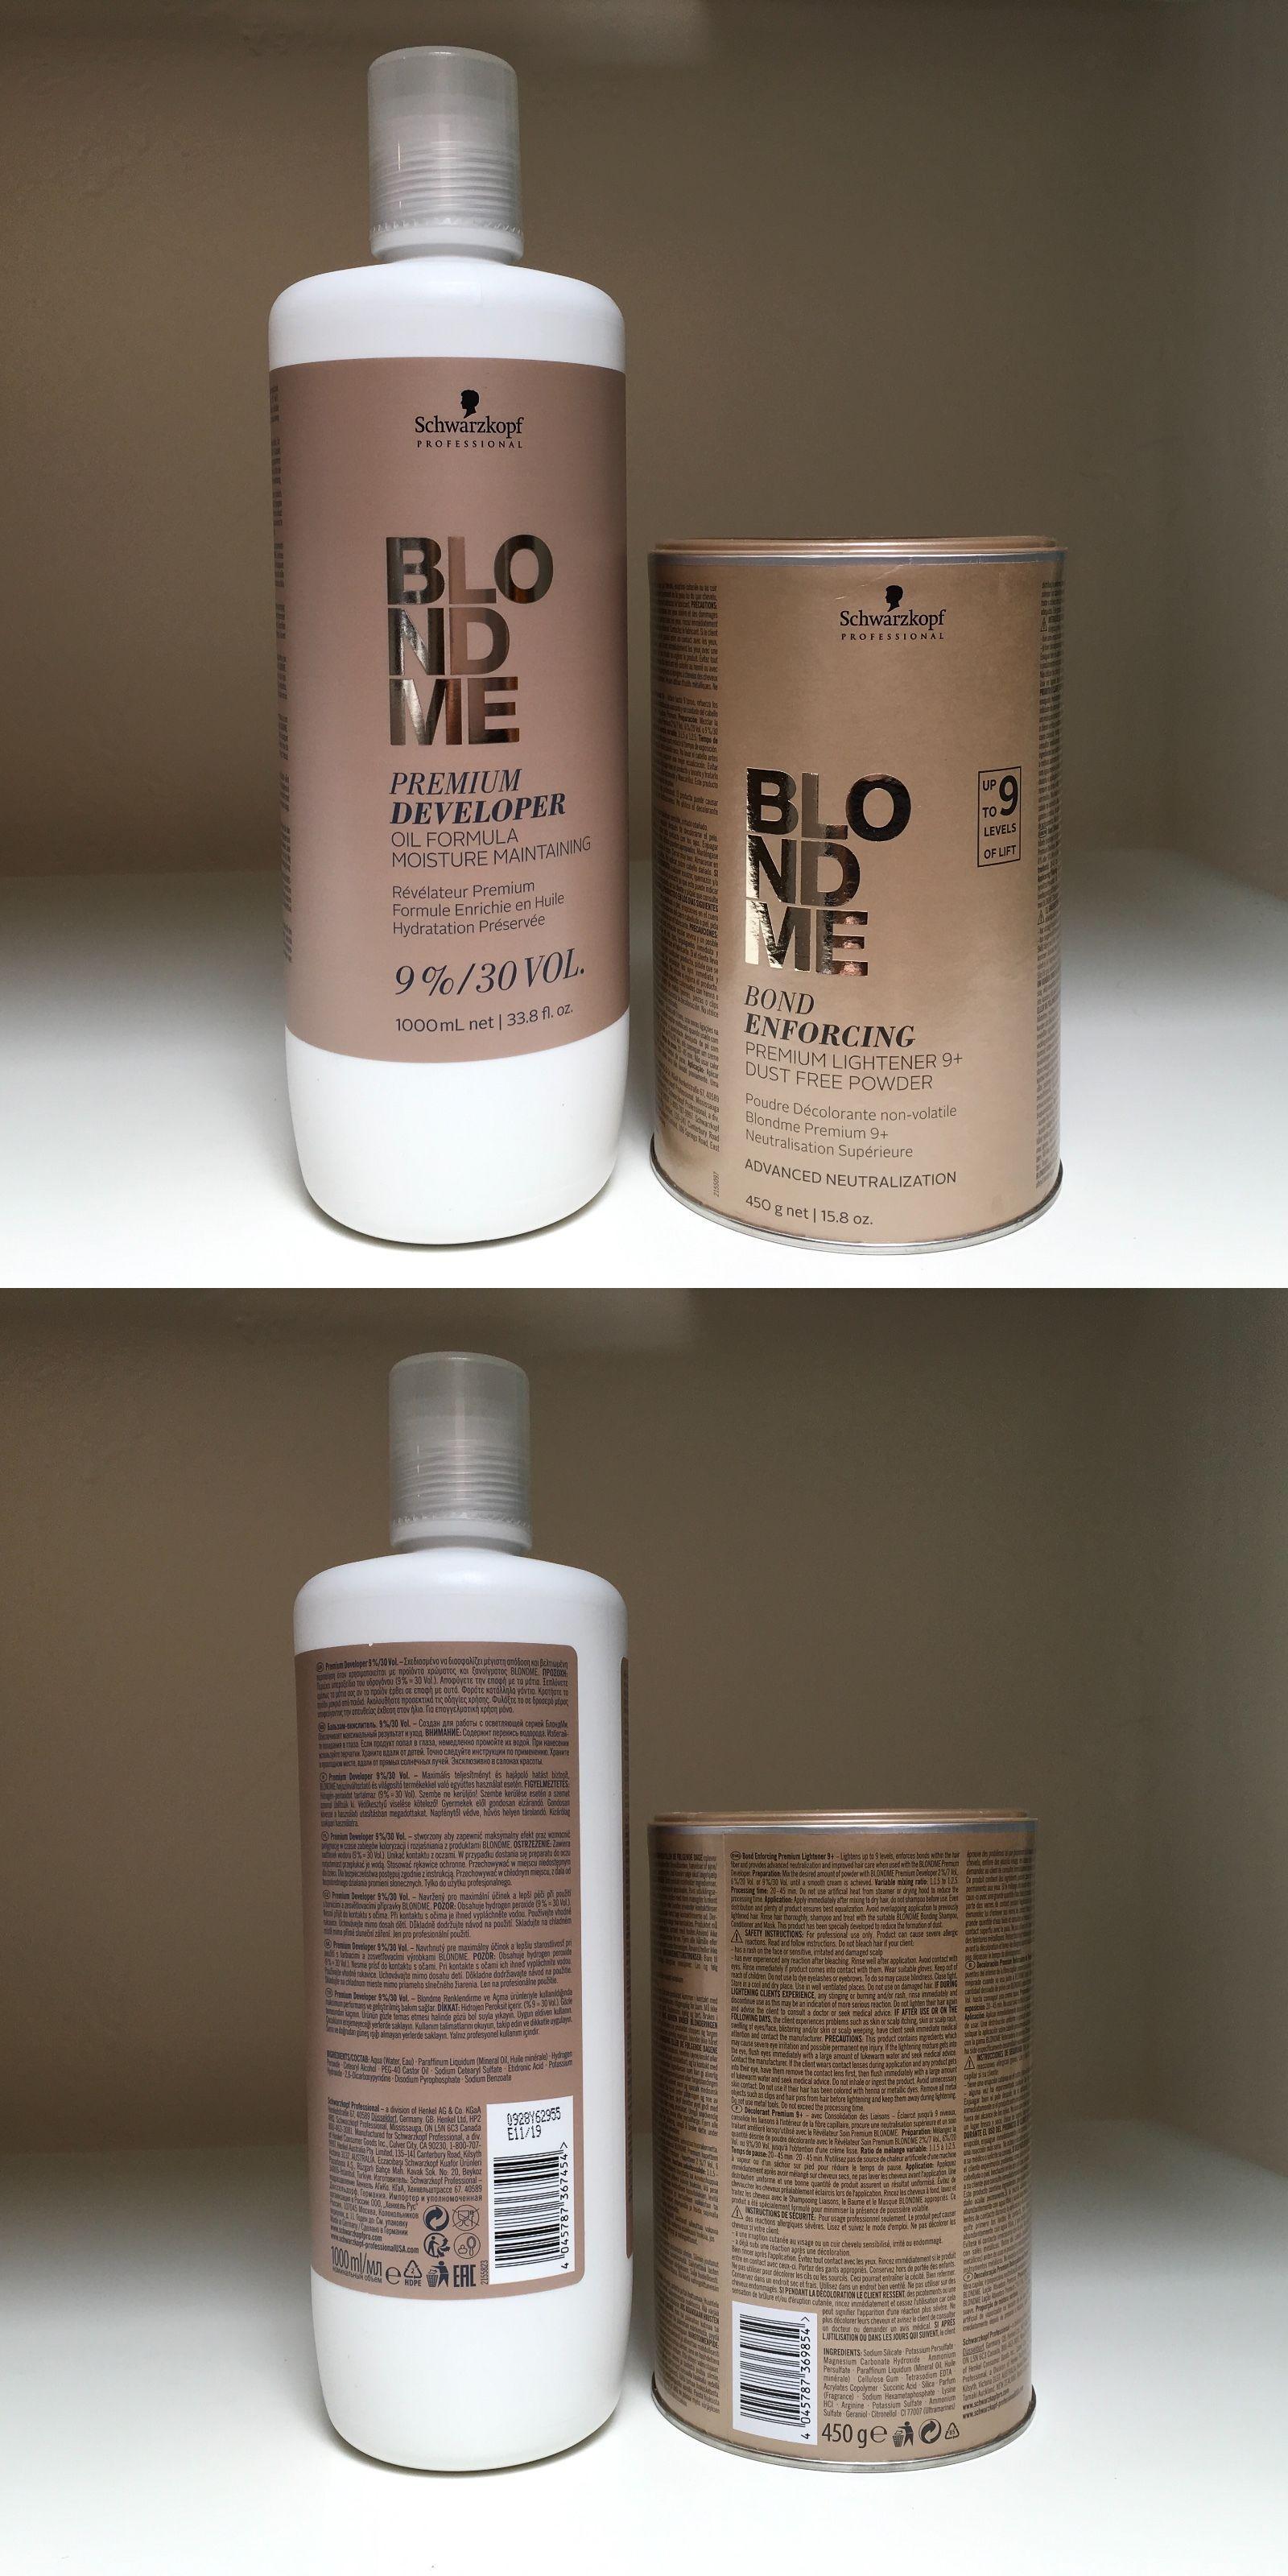 Hair Color Schwarzkopf Blondme Premium Lightener 9 And Developer 9